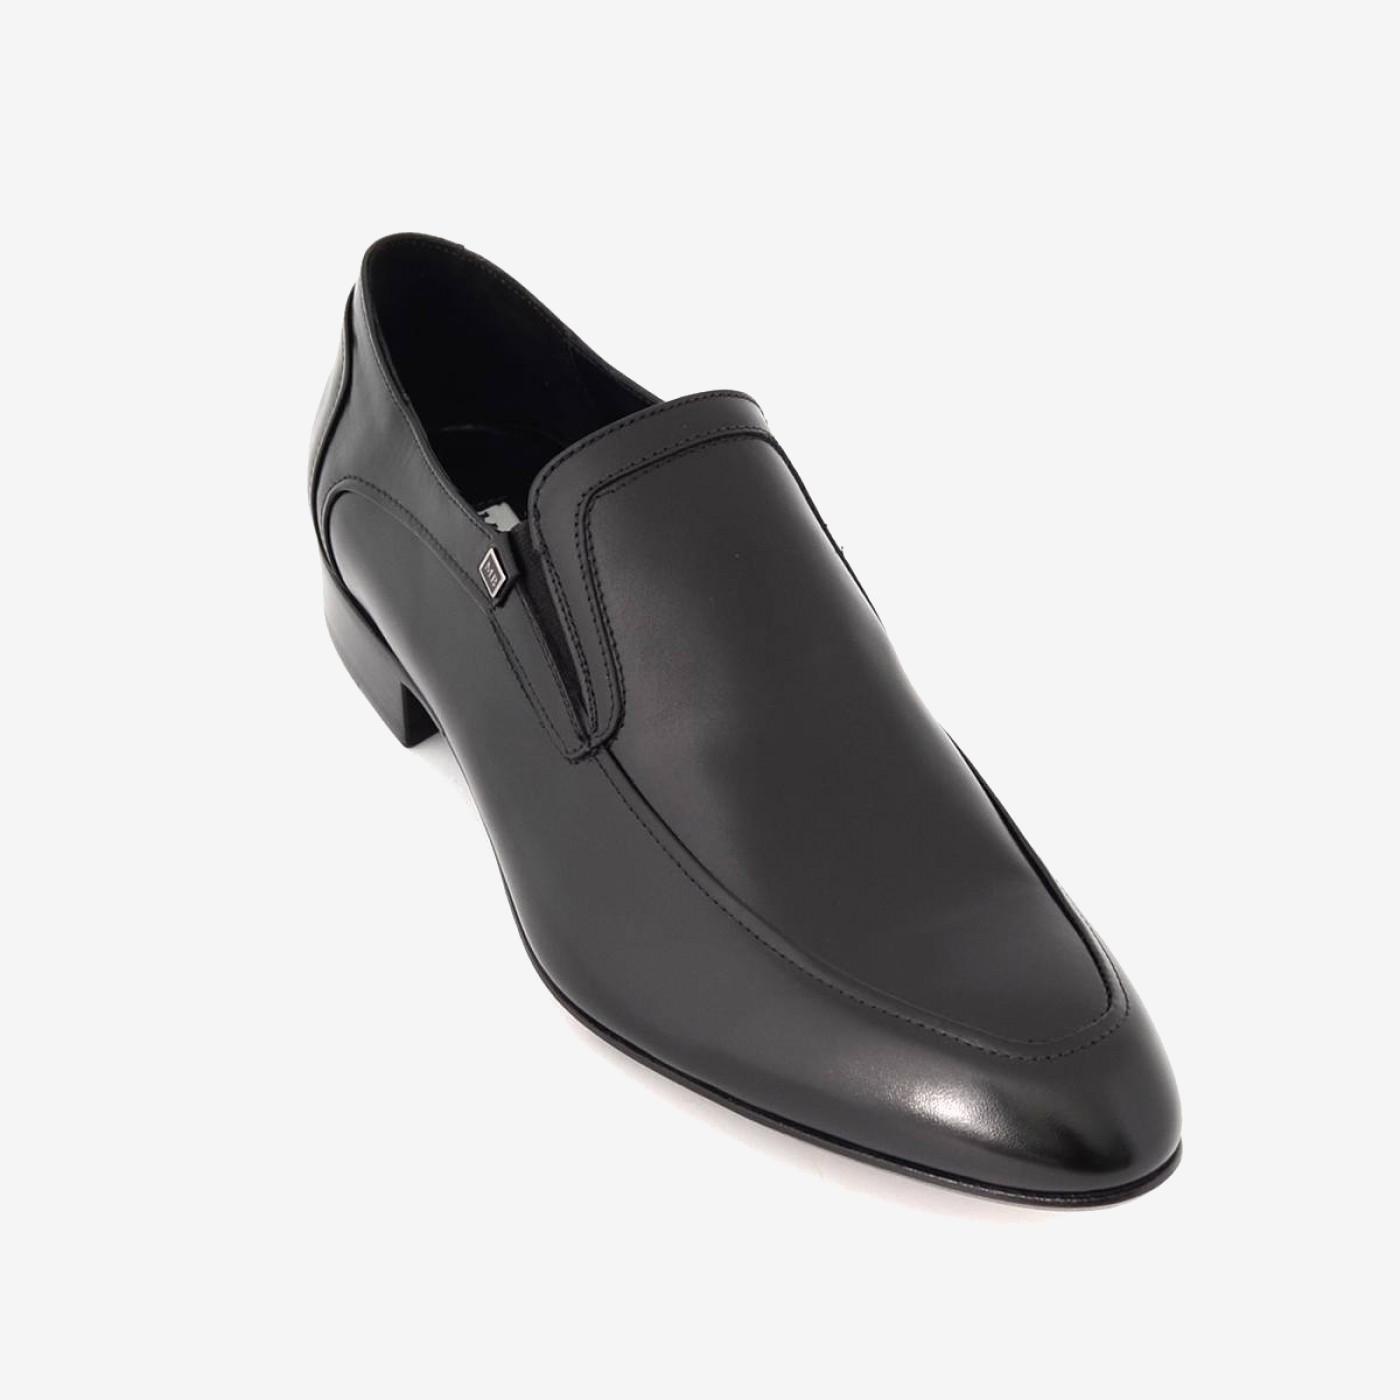 e8f752e819b Black Leather Loafers Mario Bruni on Storenvy